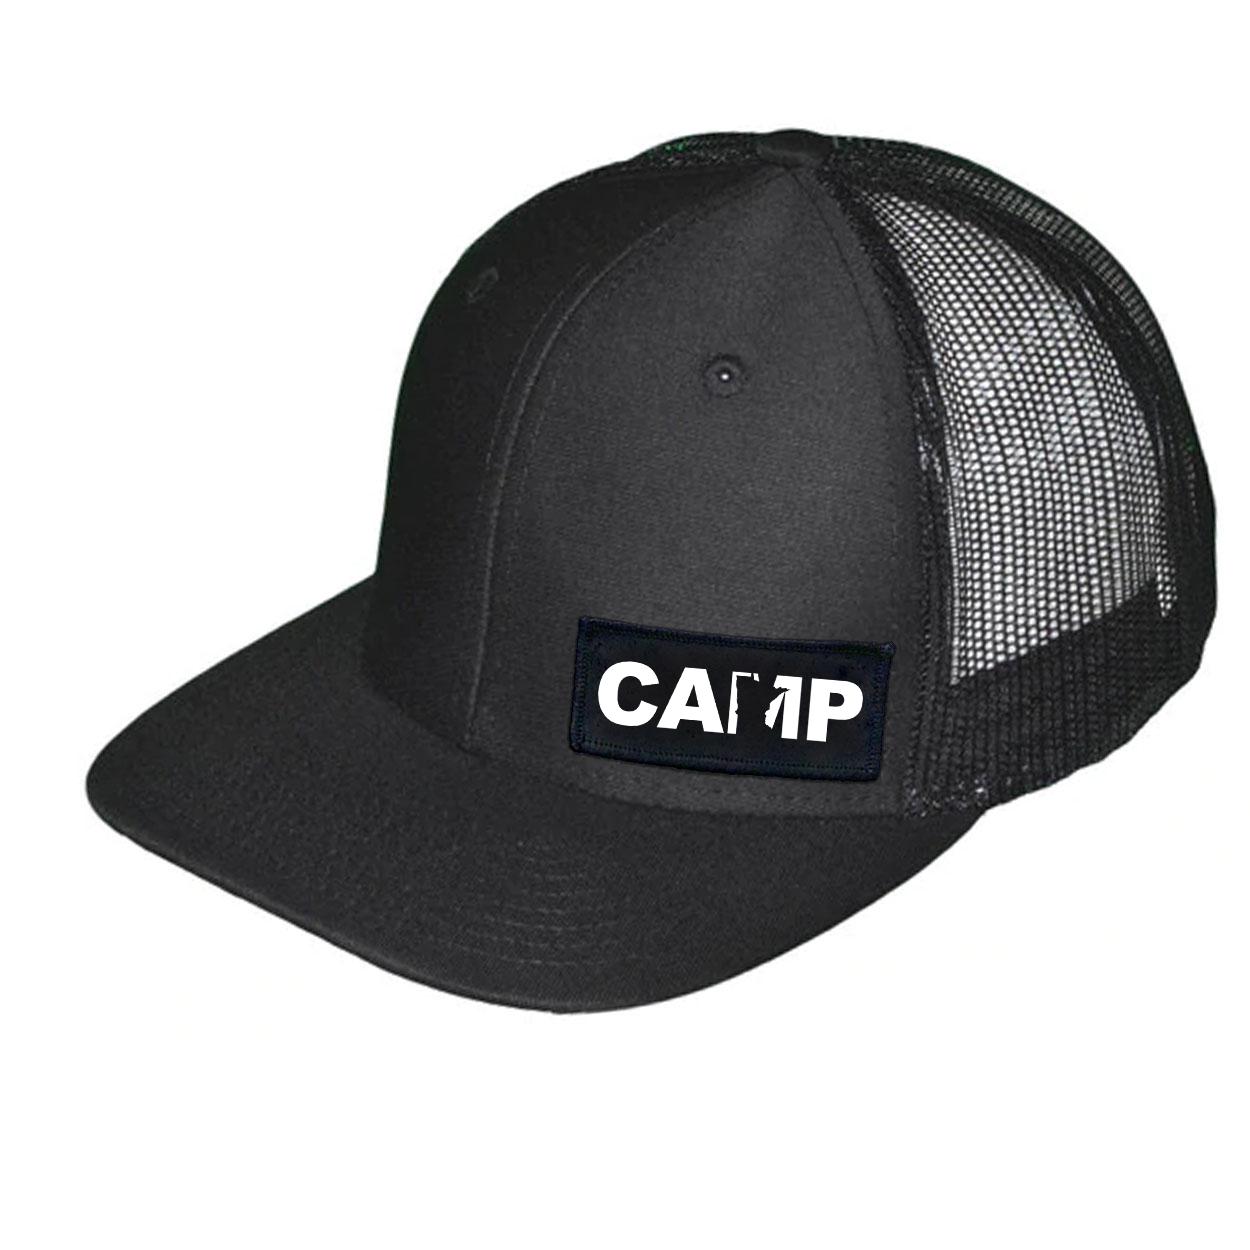 Camp Minnesota Night Out Woven Patch Snapback Trucker Hat Black (White Logo)